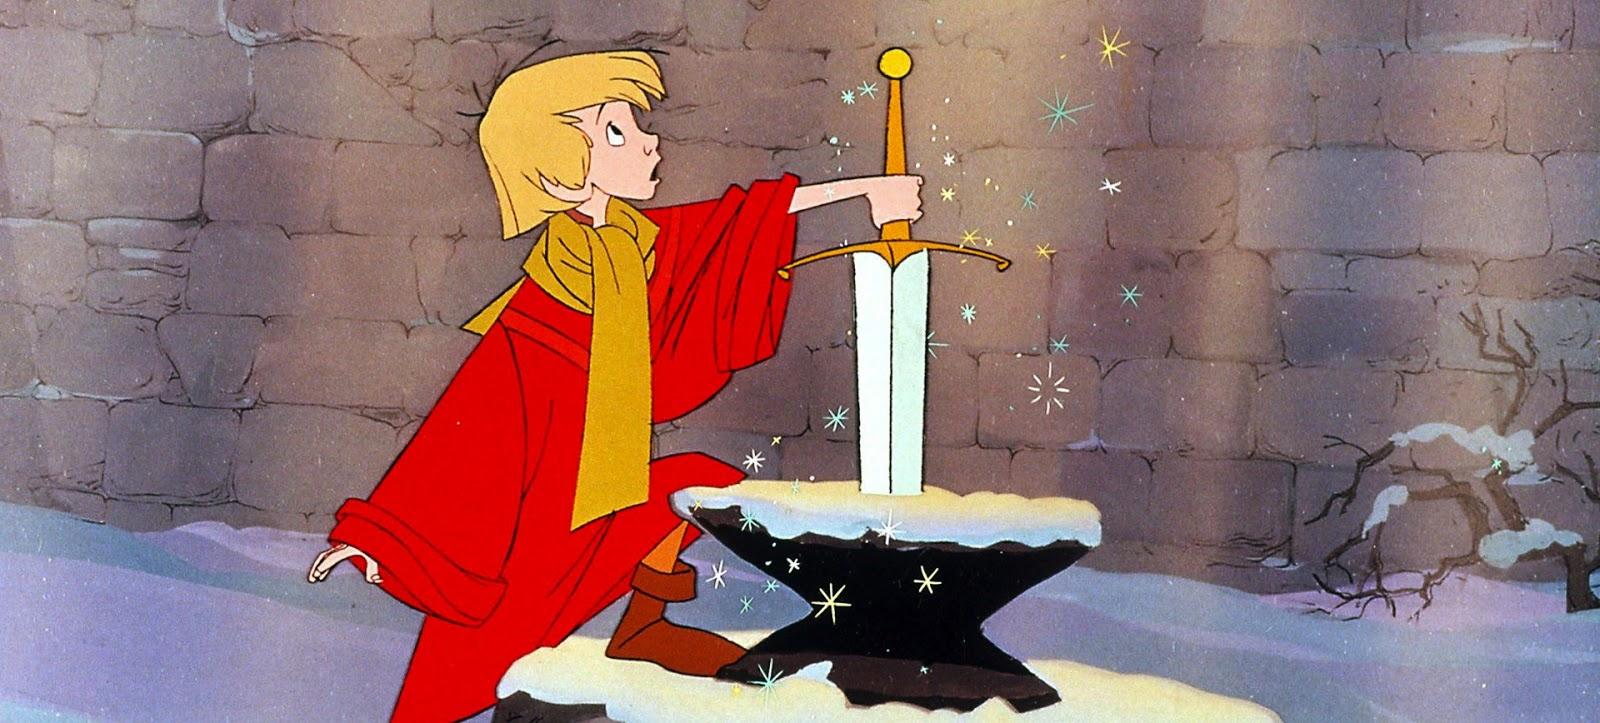 My Top Ten King Arthur Movies Multiglom Lanccelot Watch Aegis Of Attilia The Sword In Stone 1963